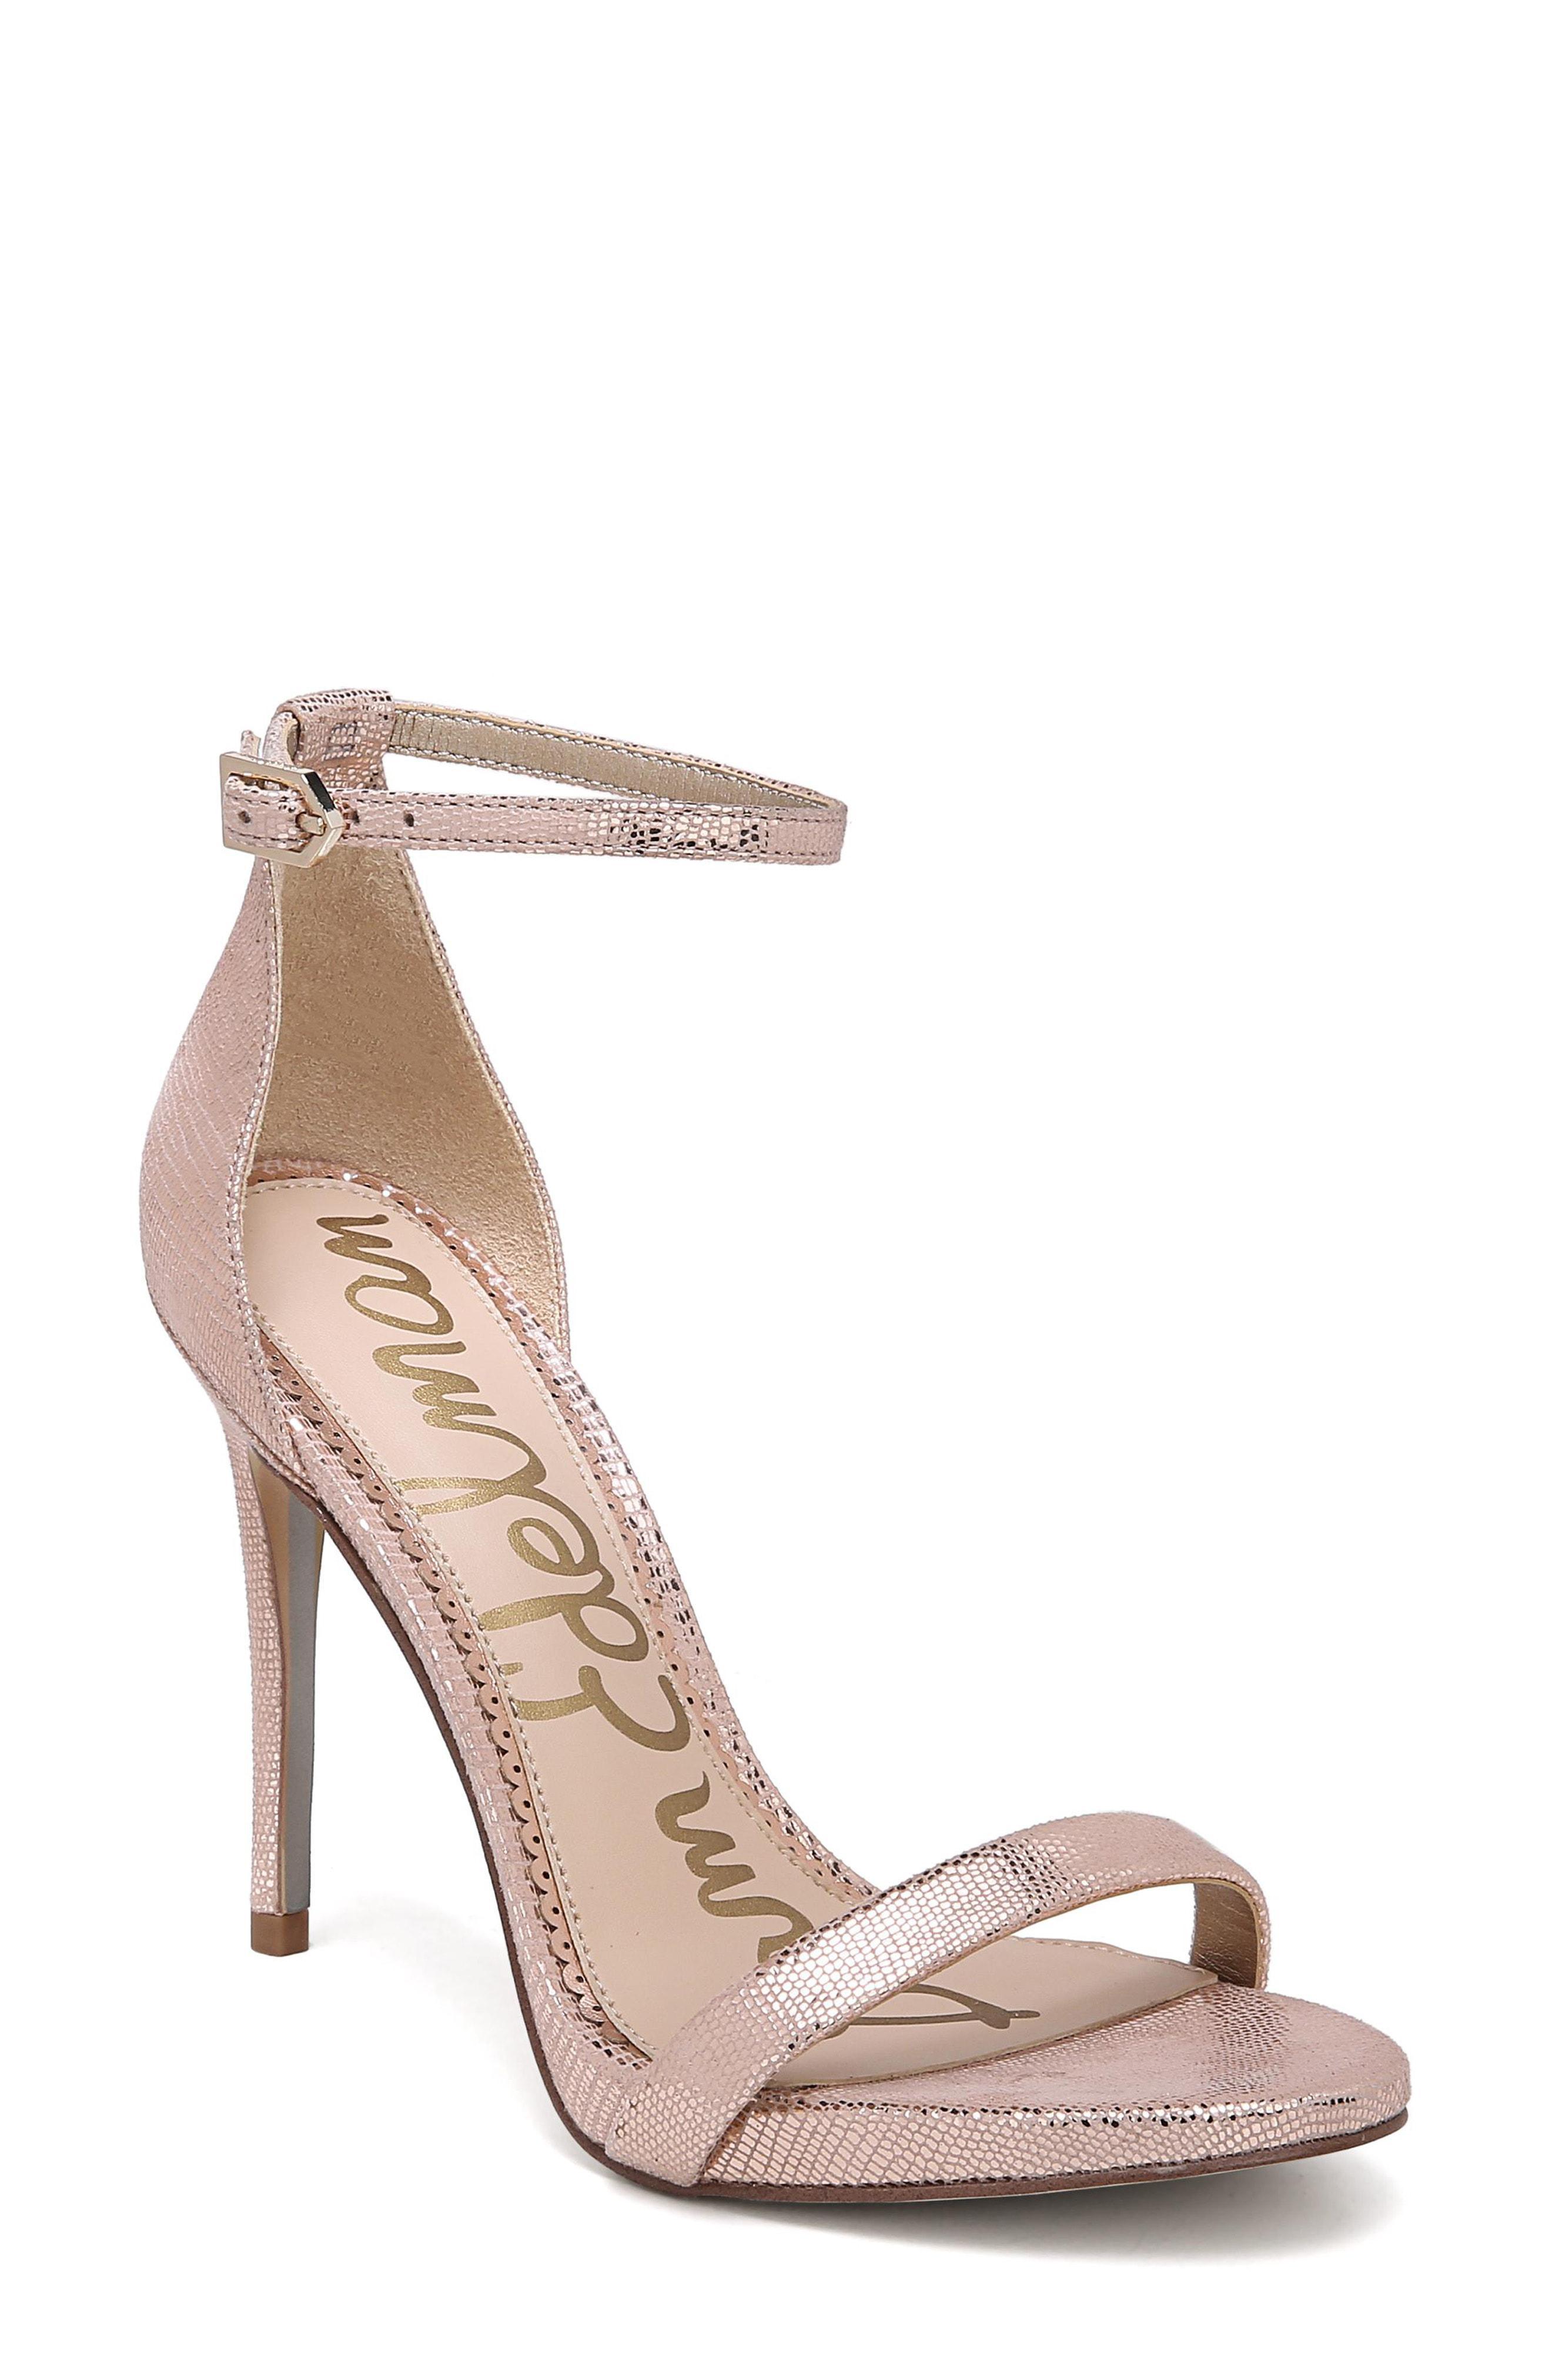 e8f543d3ef1b Lyst - Sam Edelman Ariella Ankle Strap Sandal in Natural